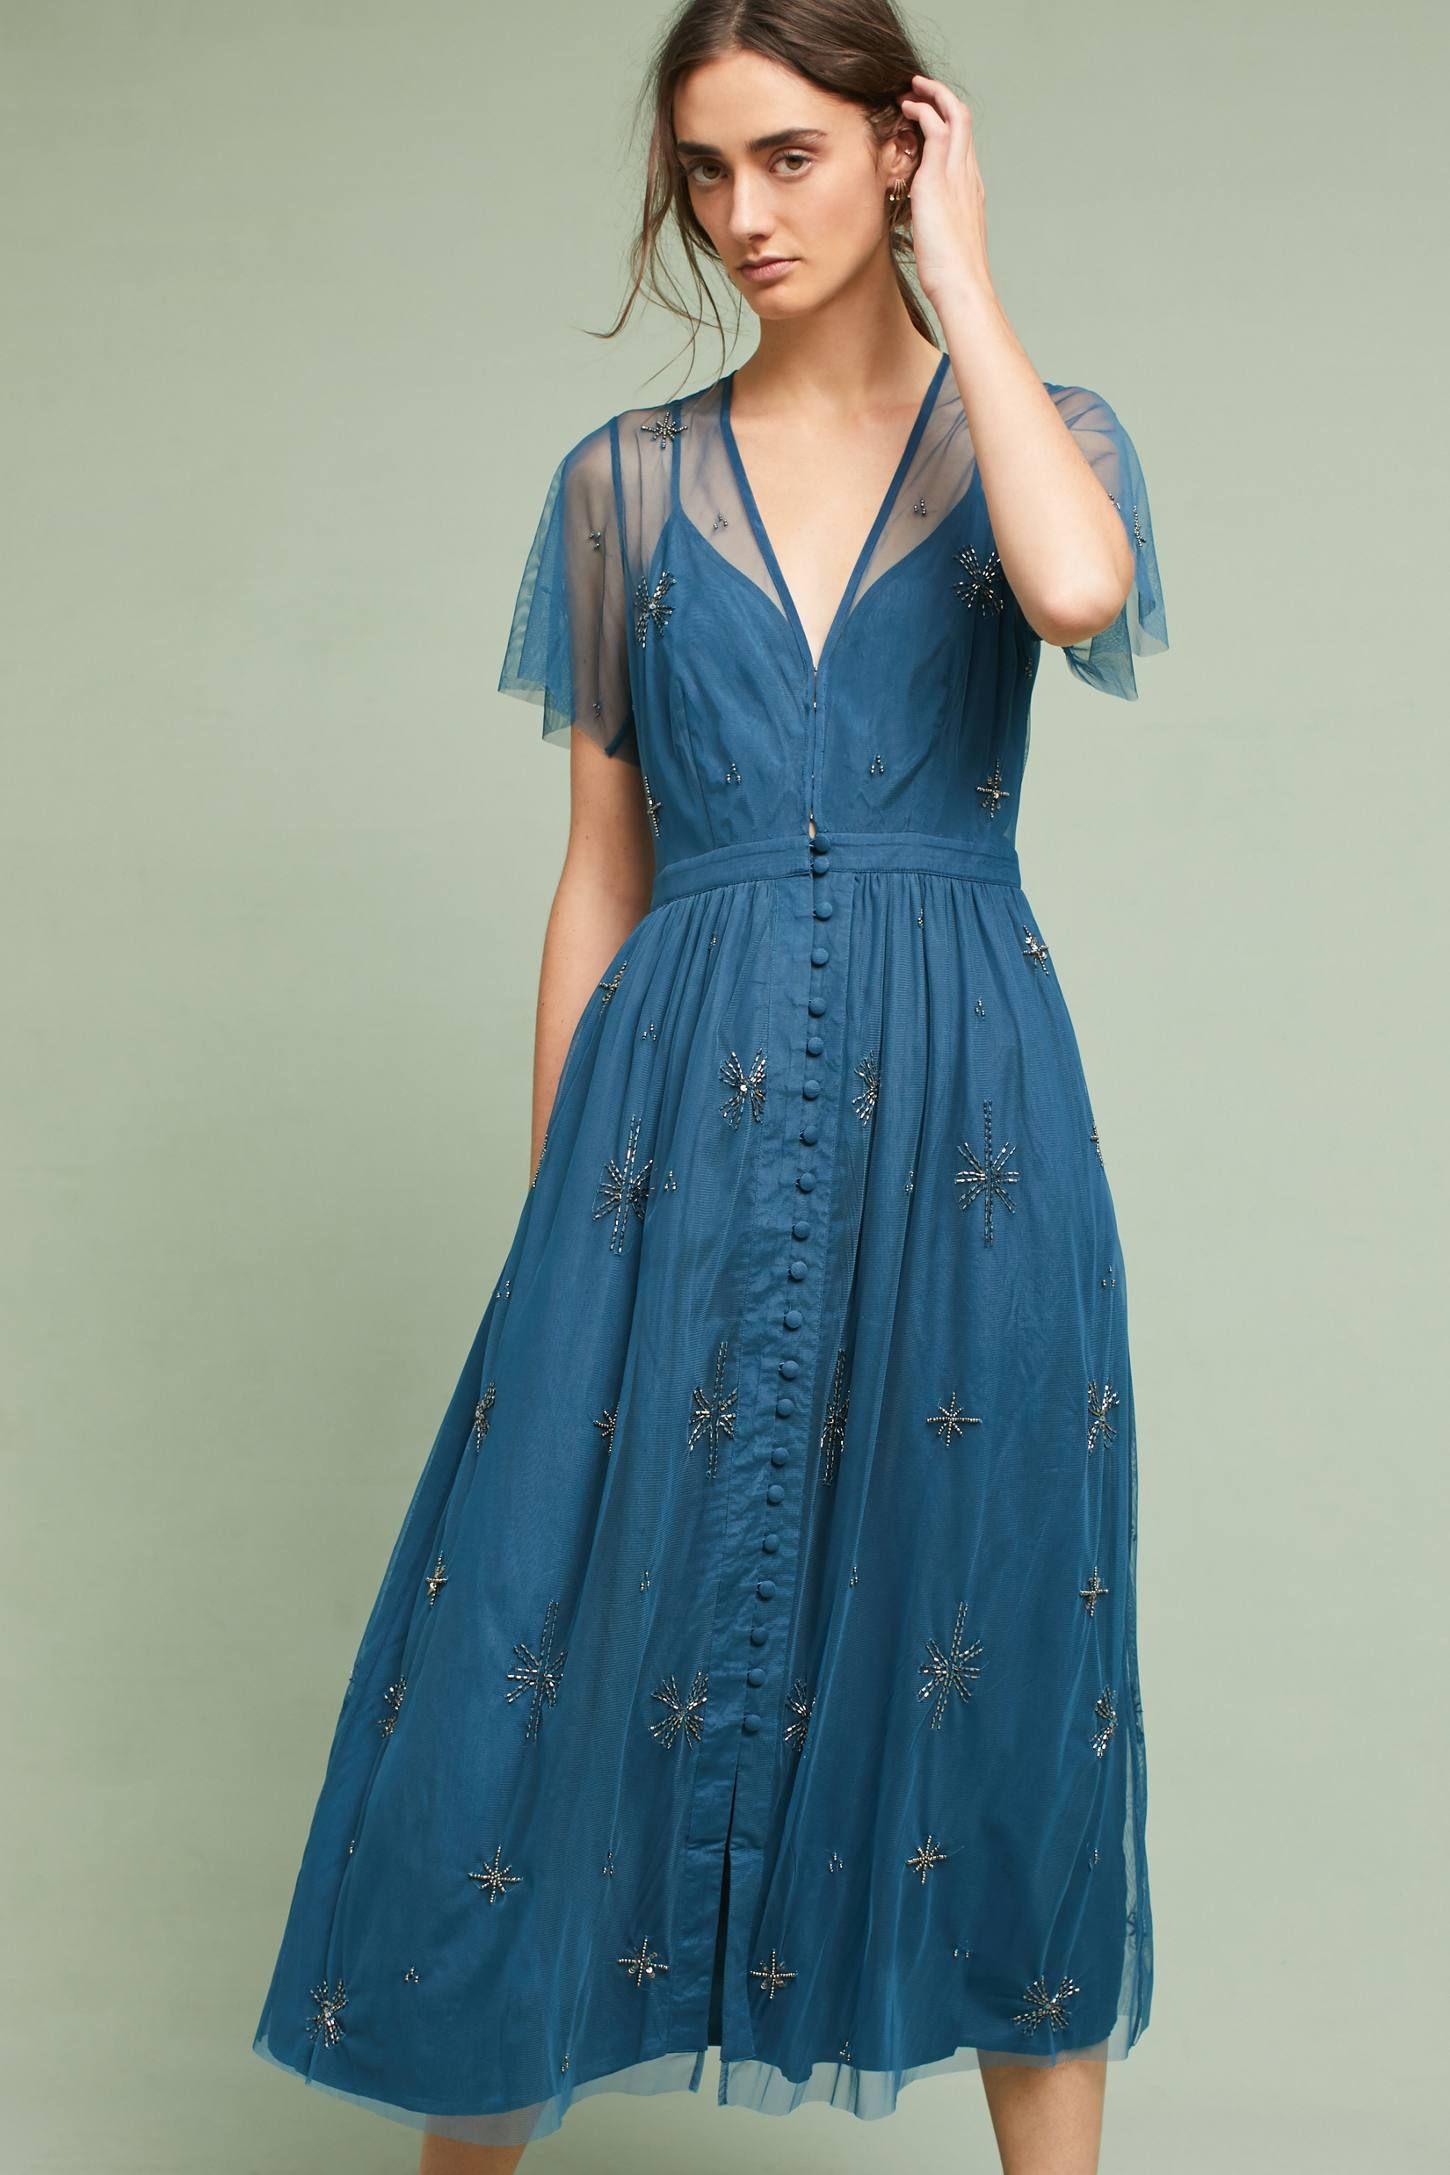 Lille Beaded Midi Dress | Lille, Midi dresses and Anthropologie